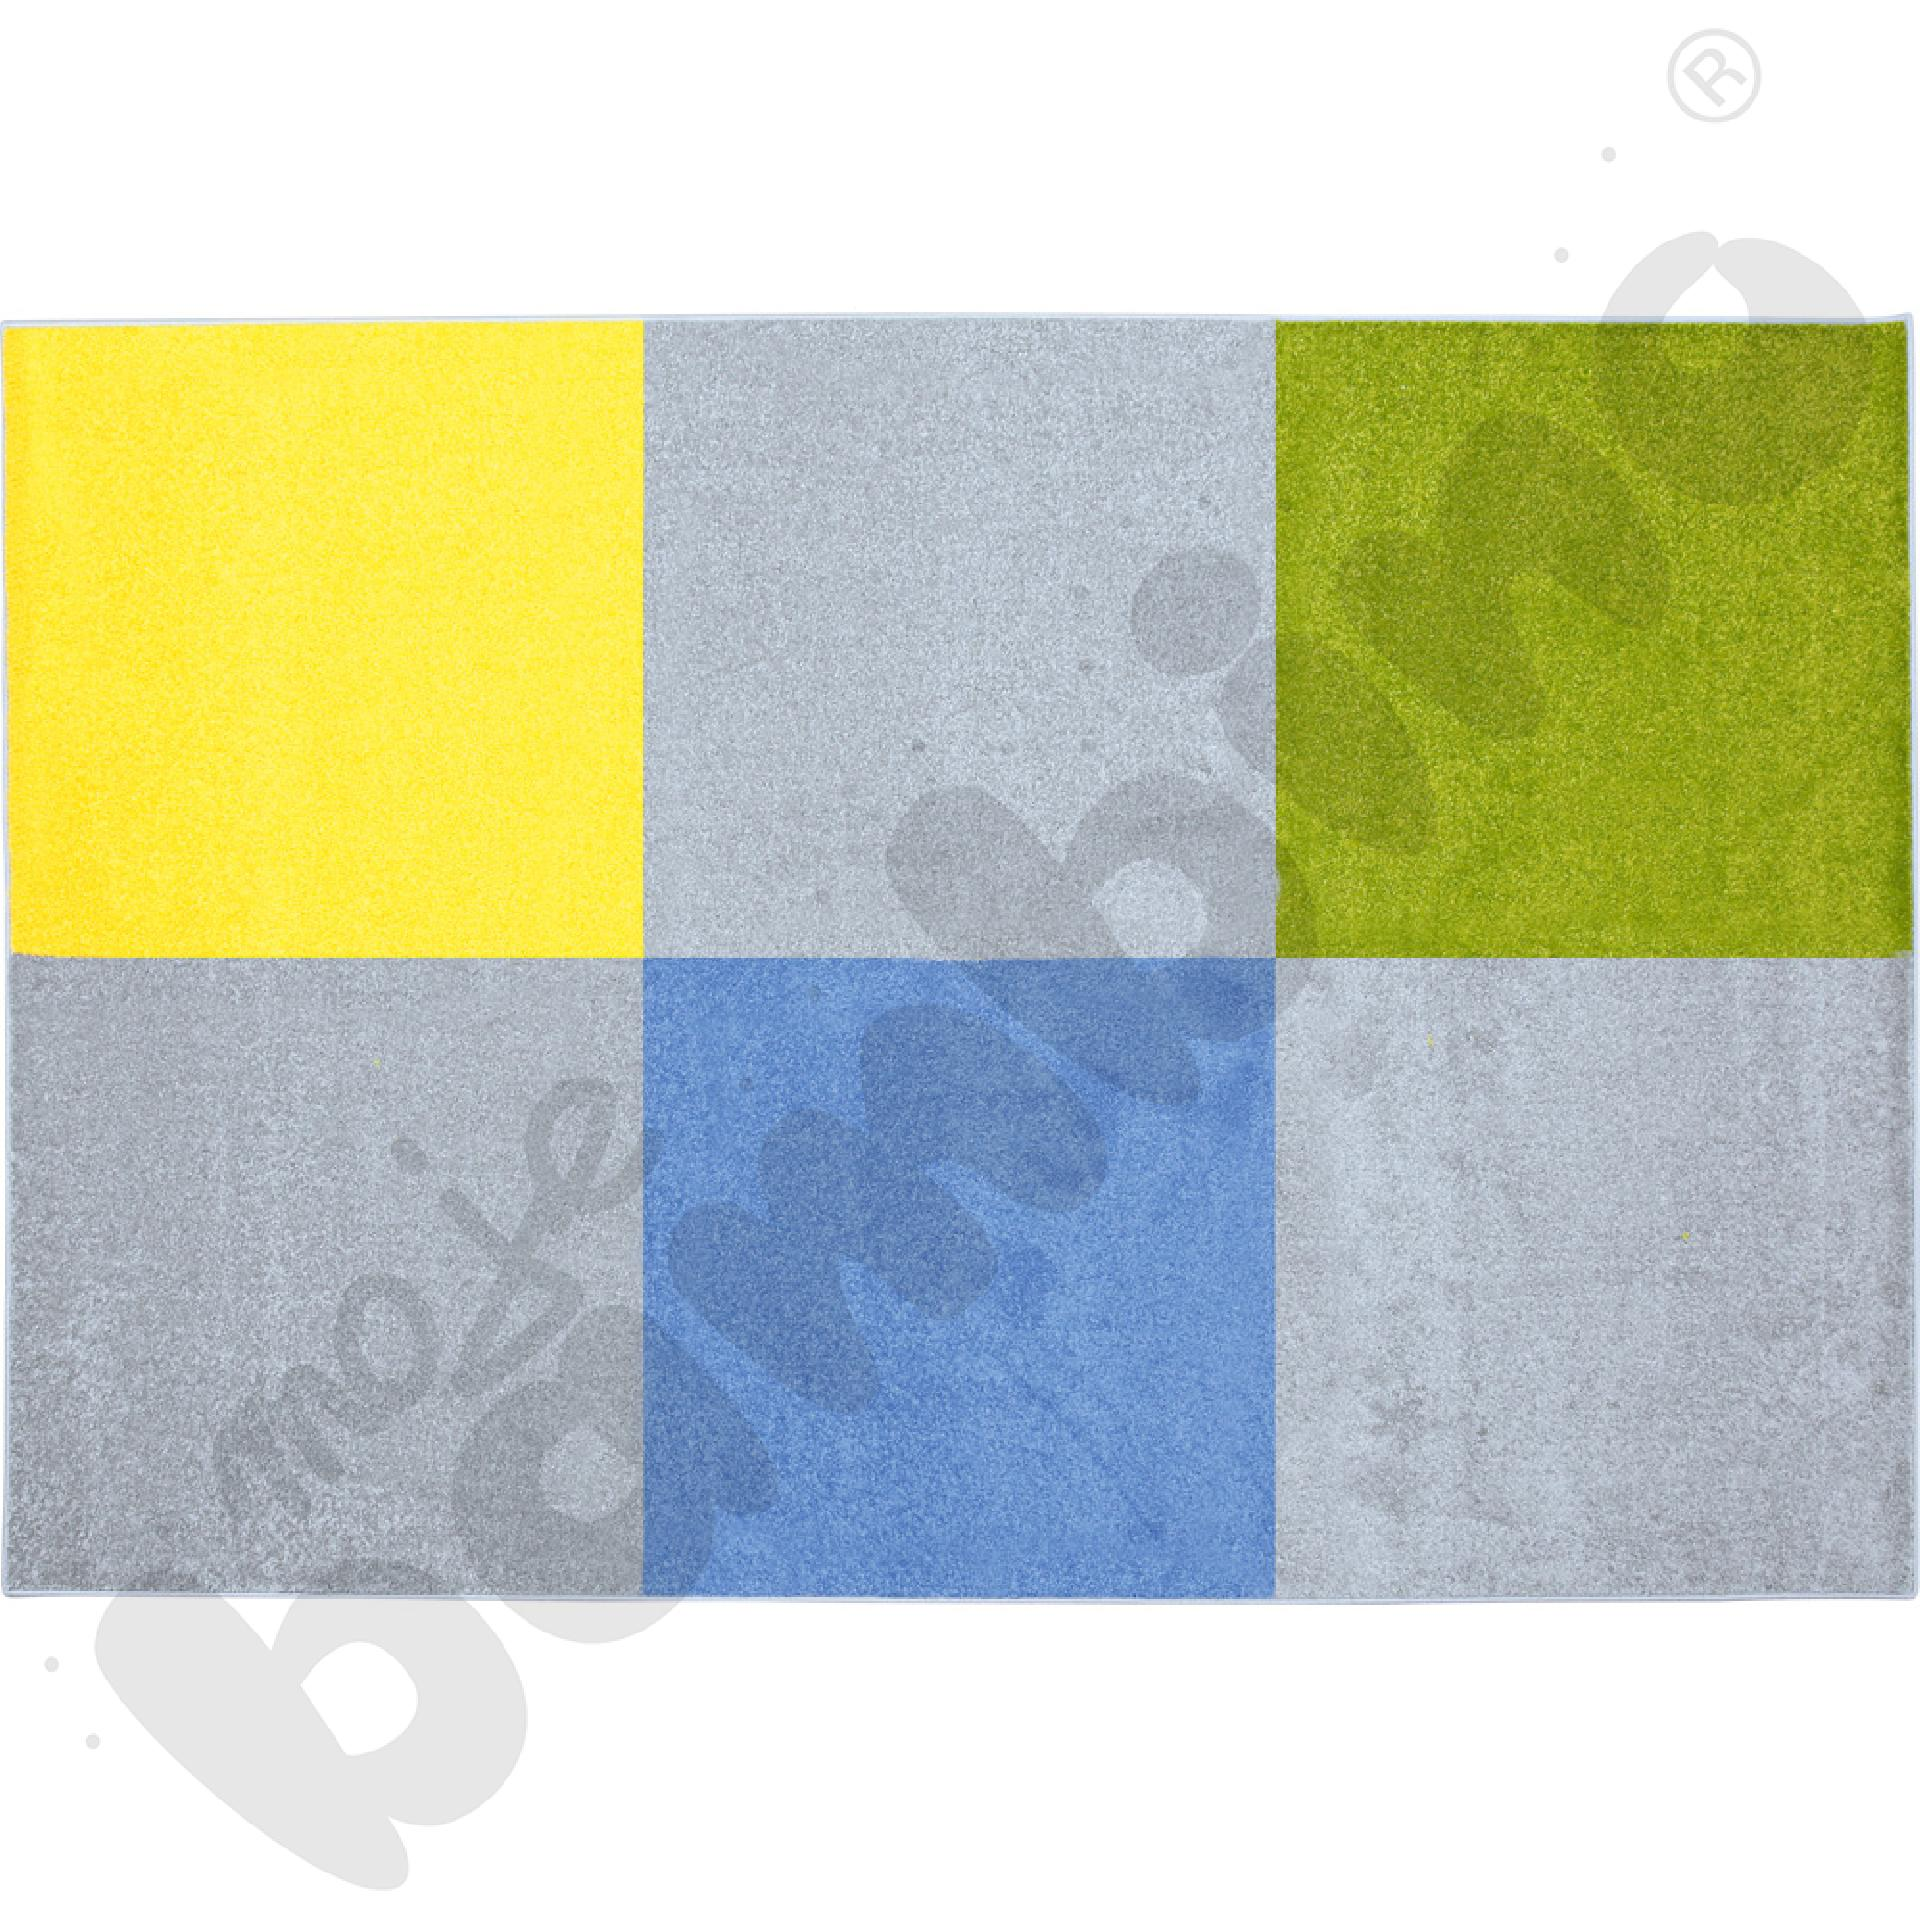 Dywan mozaika 2 x 3 m